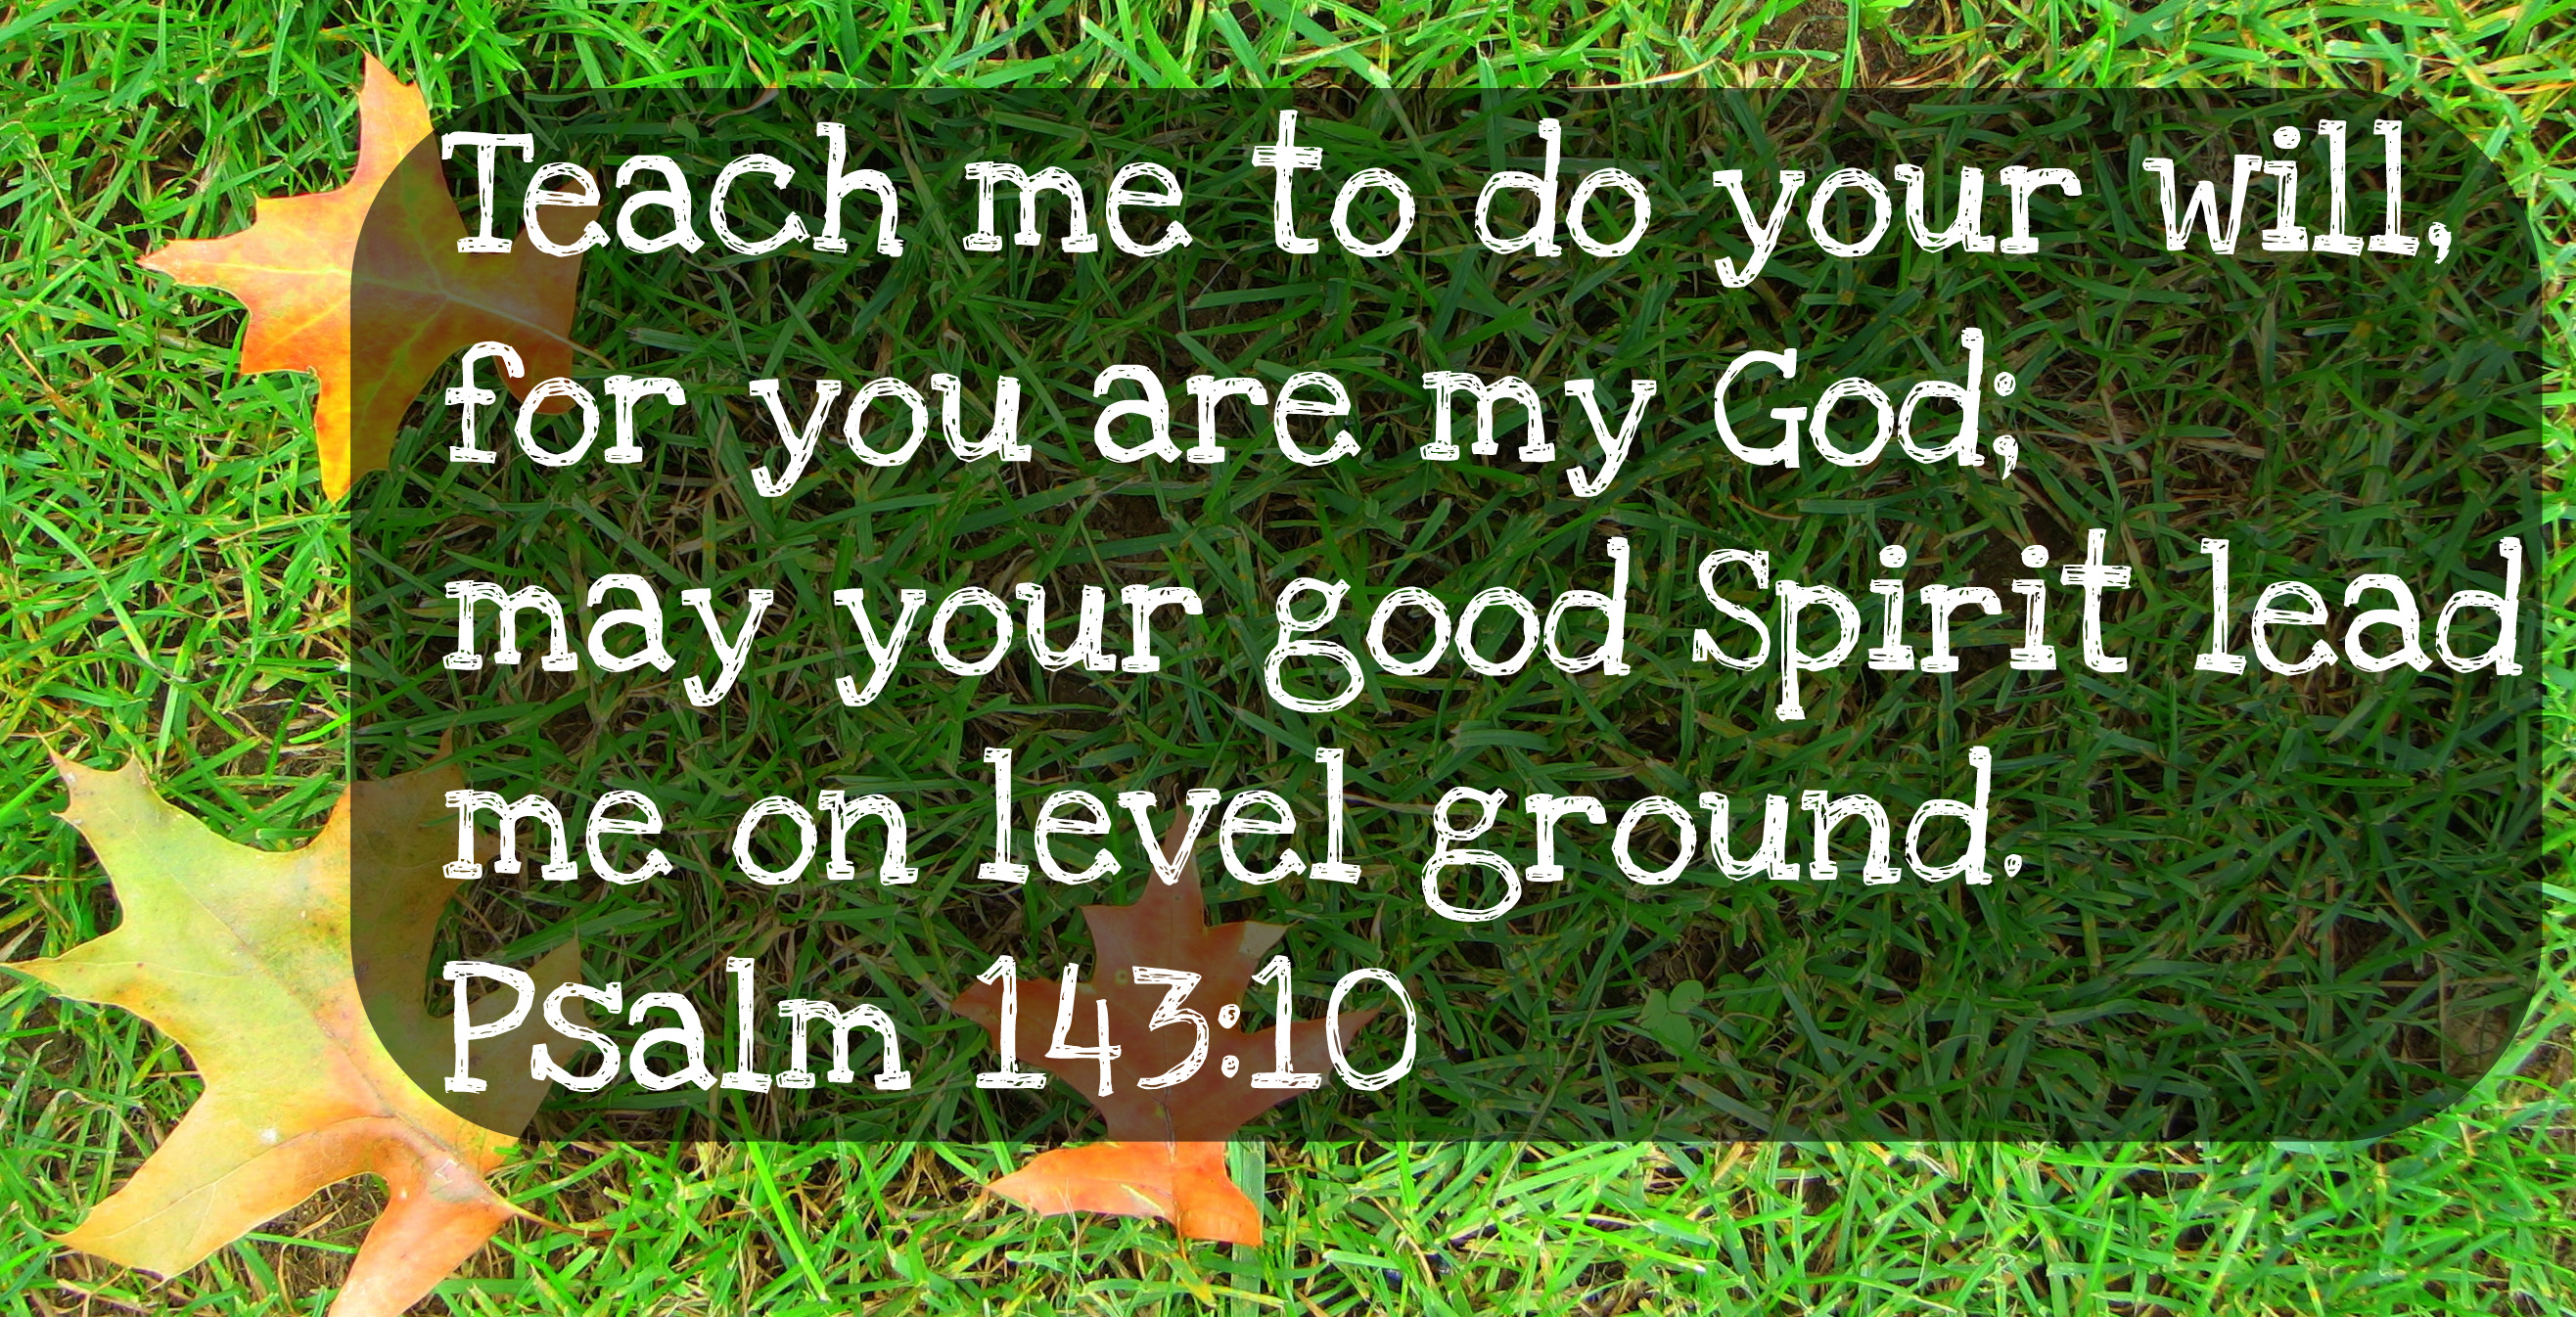 teach me how to preach